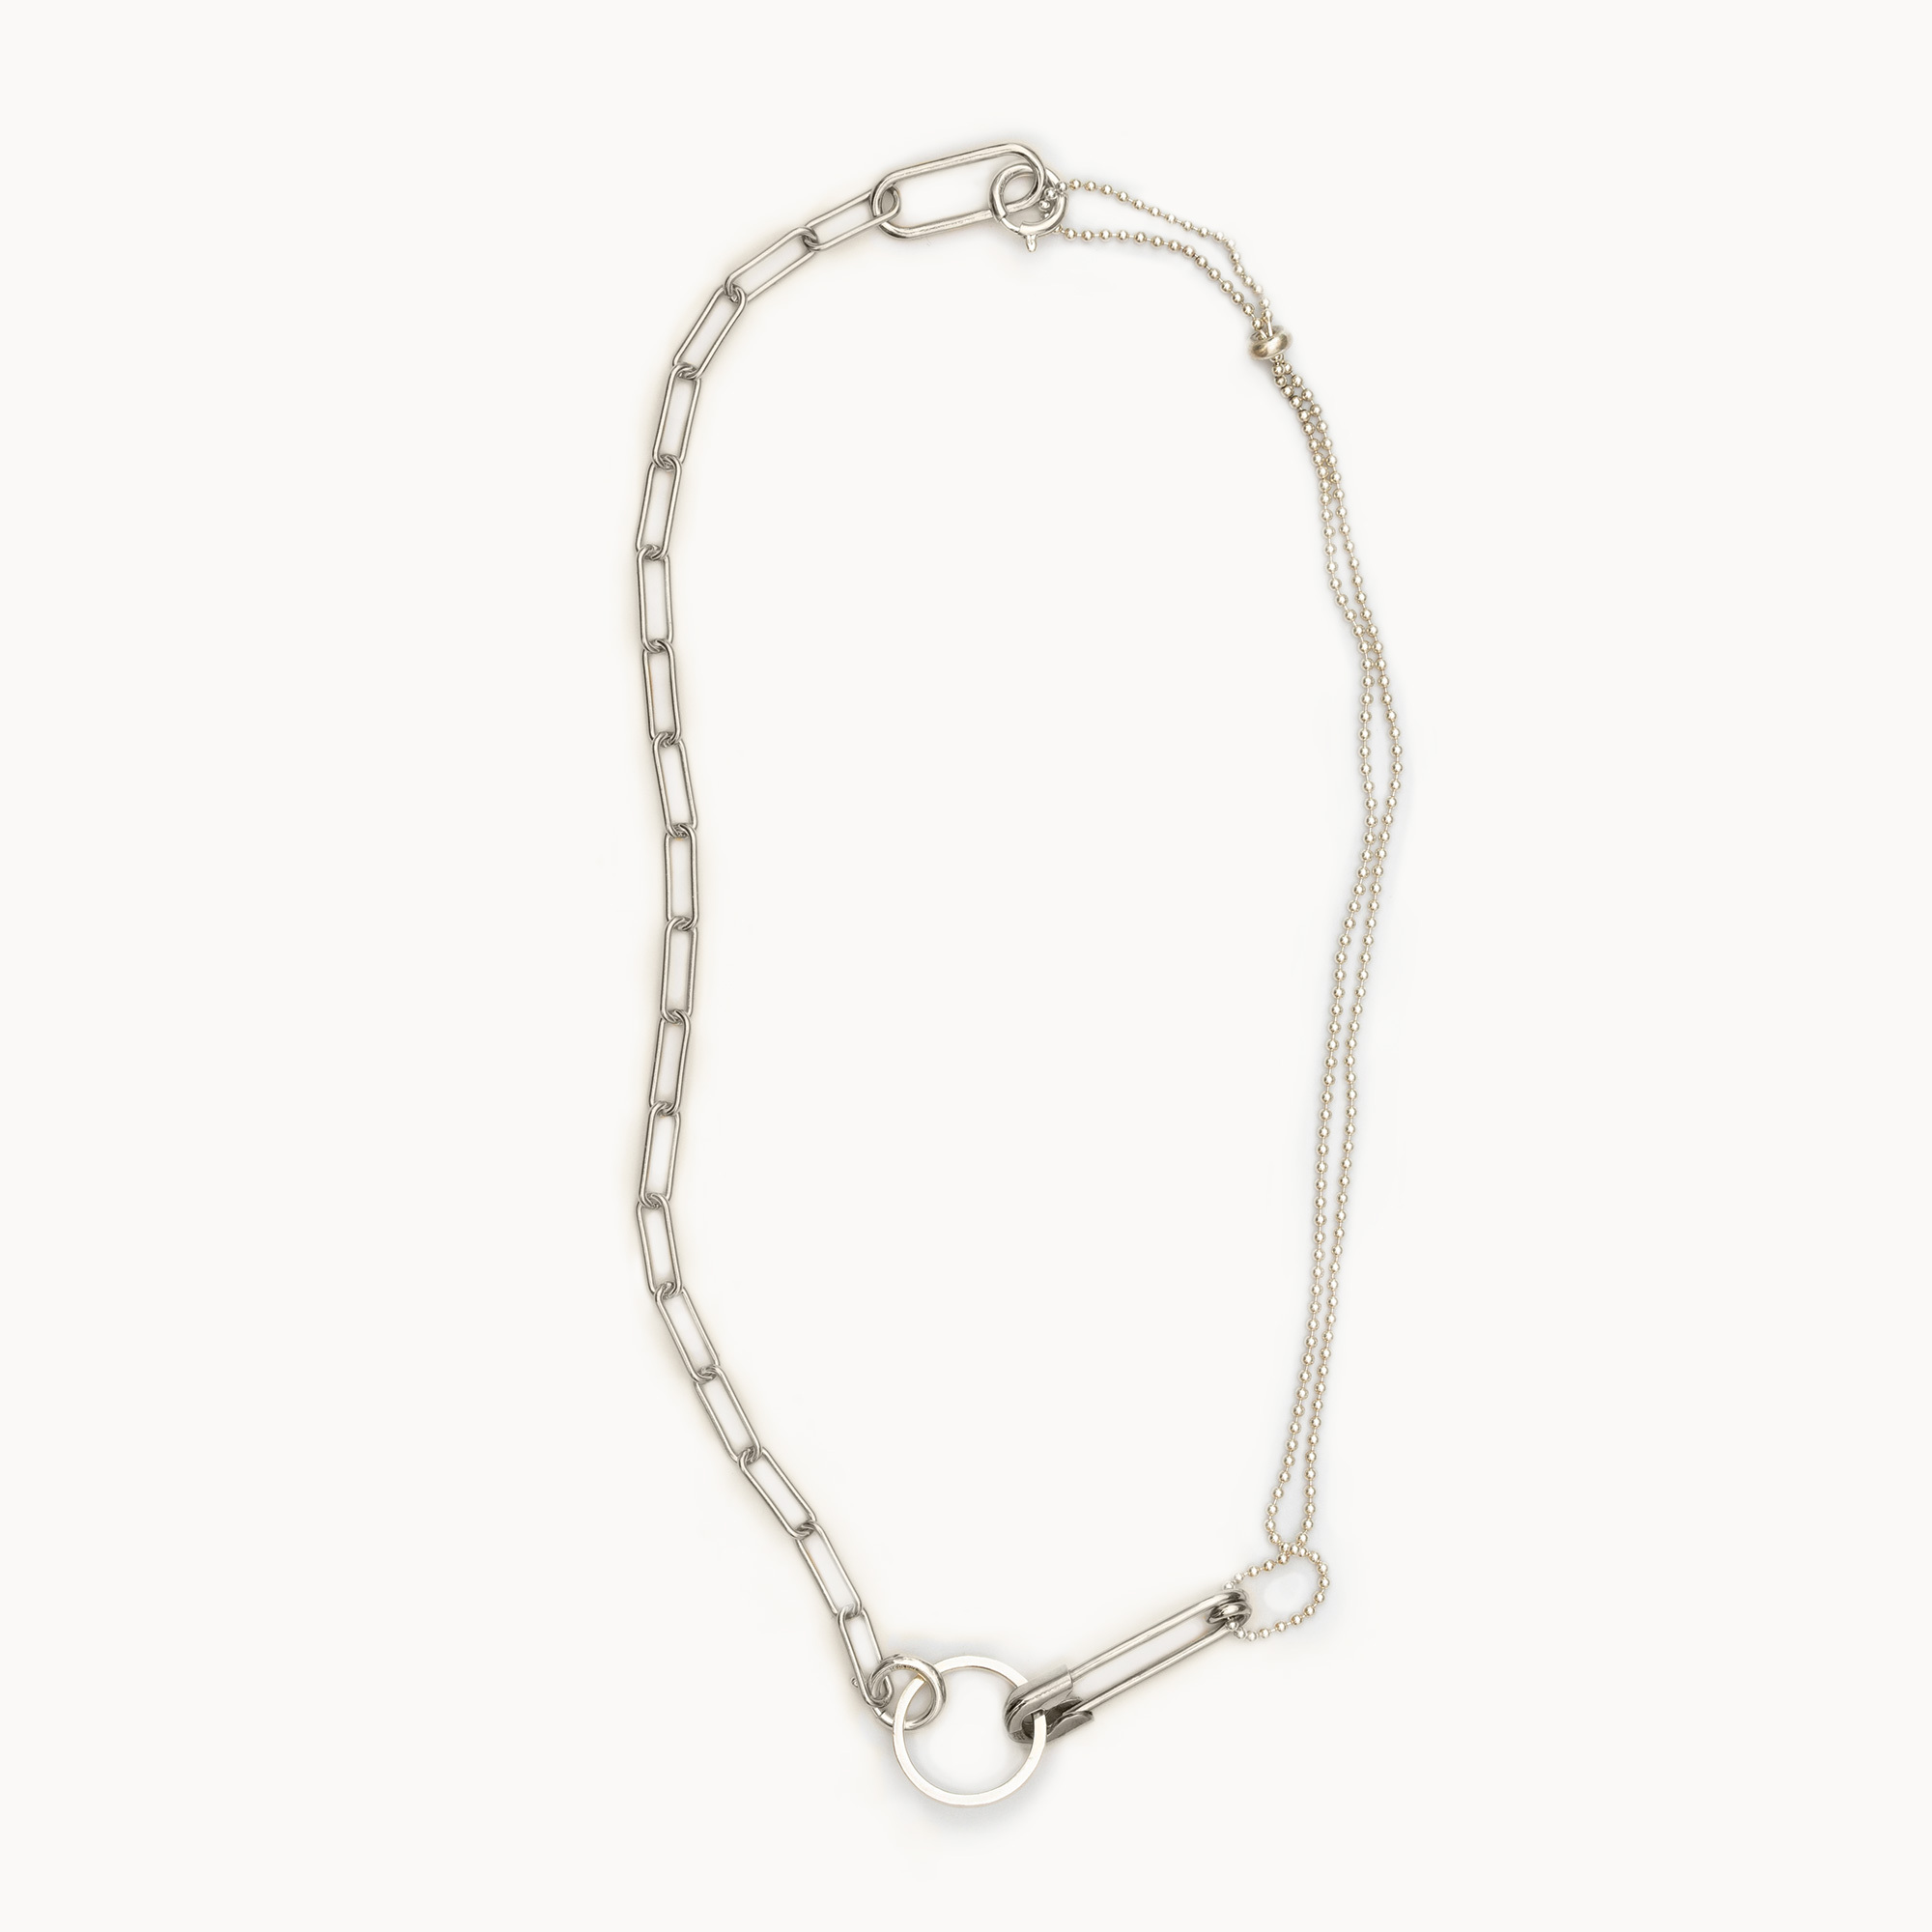 Necklace / Glasses Holder|ネックレス / グラスホルダー - art.1905N061010